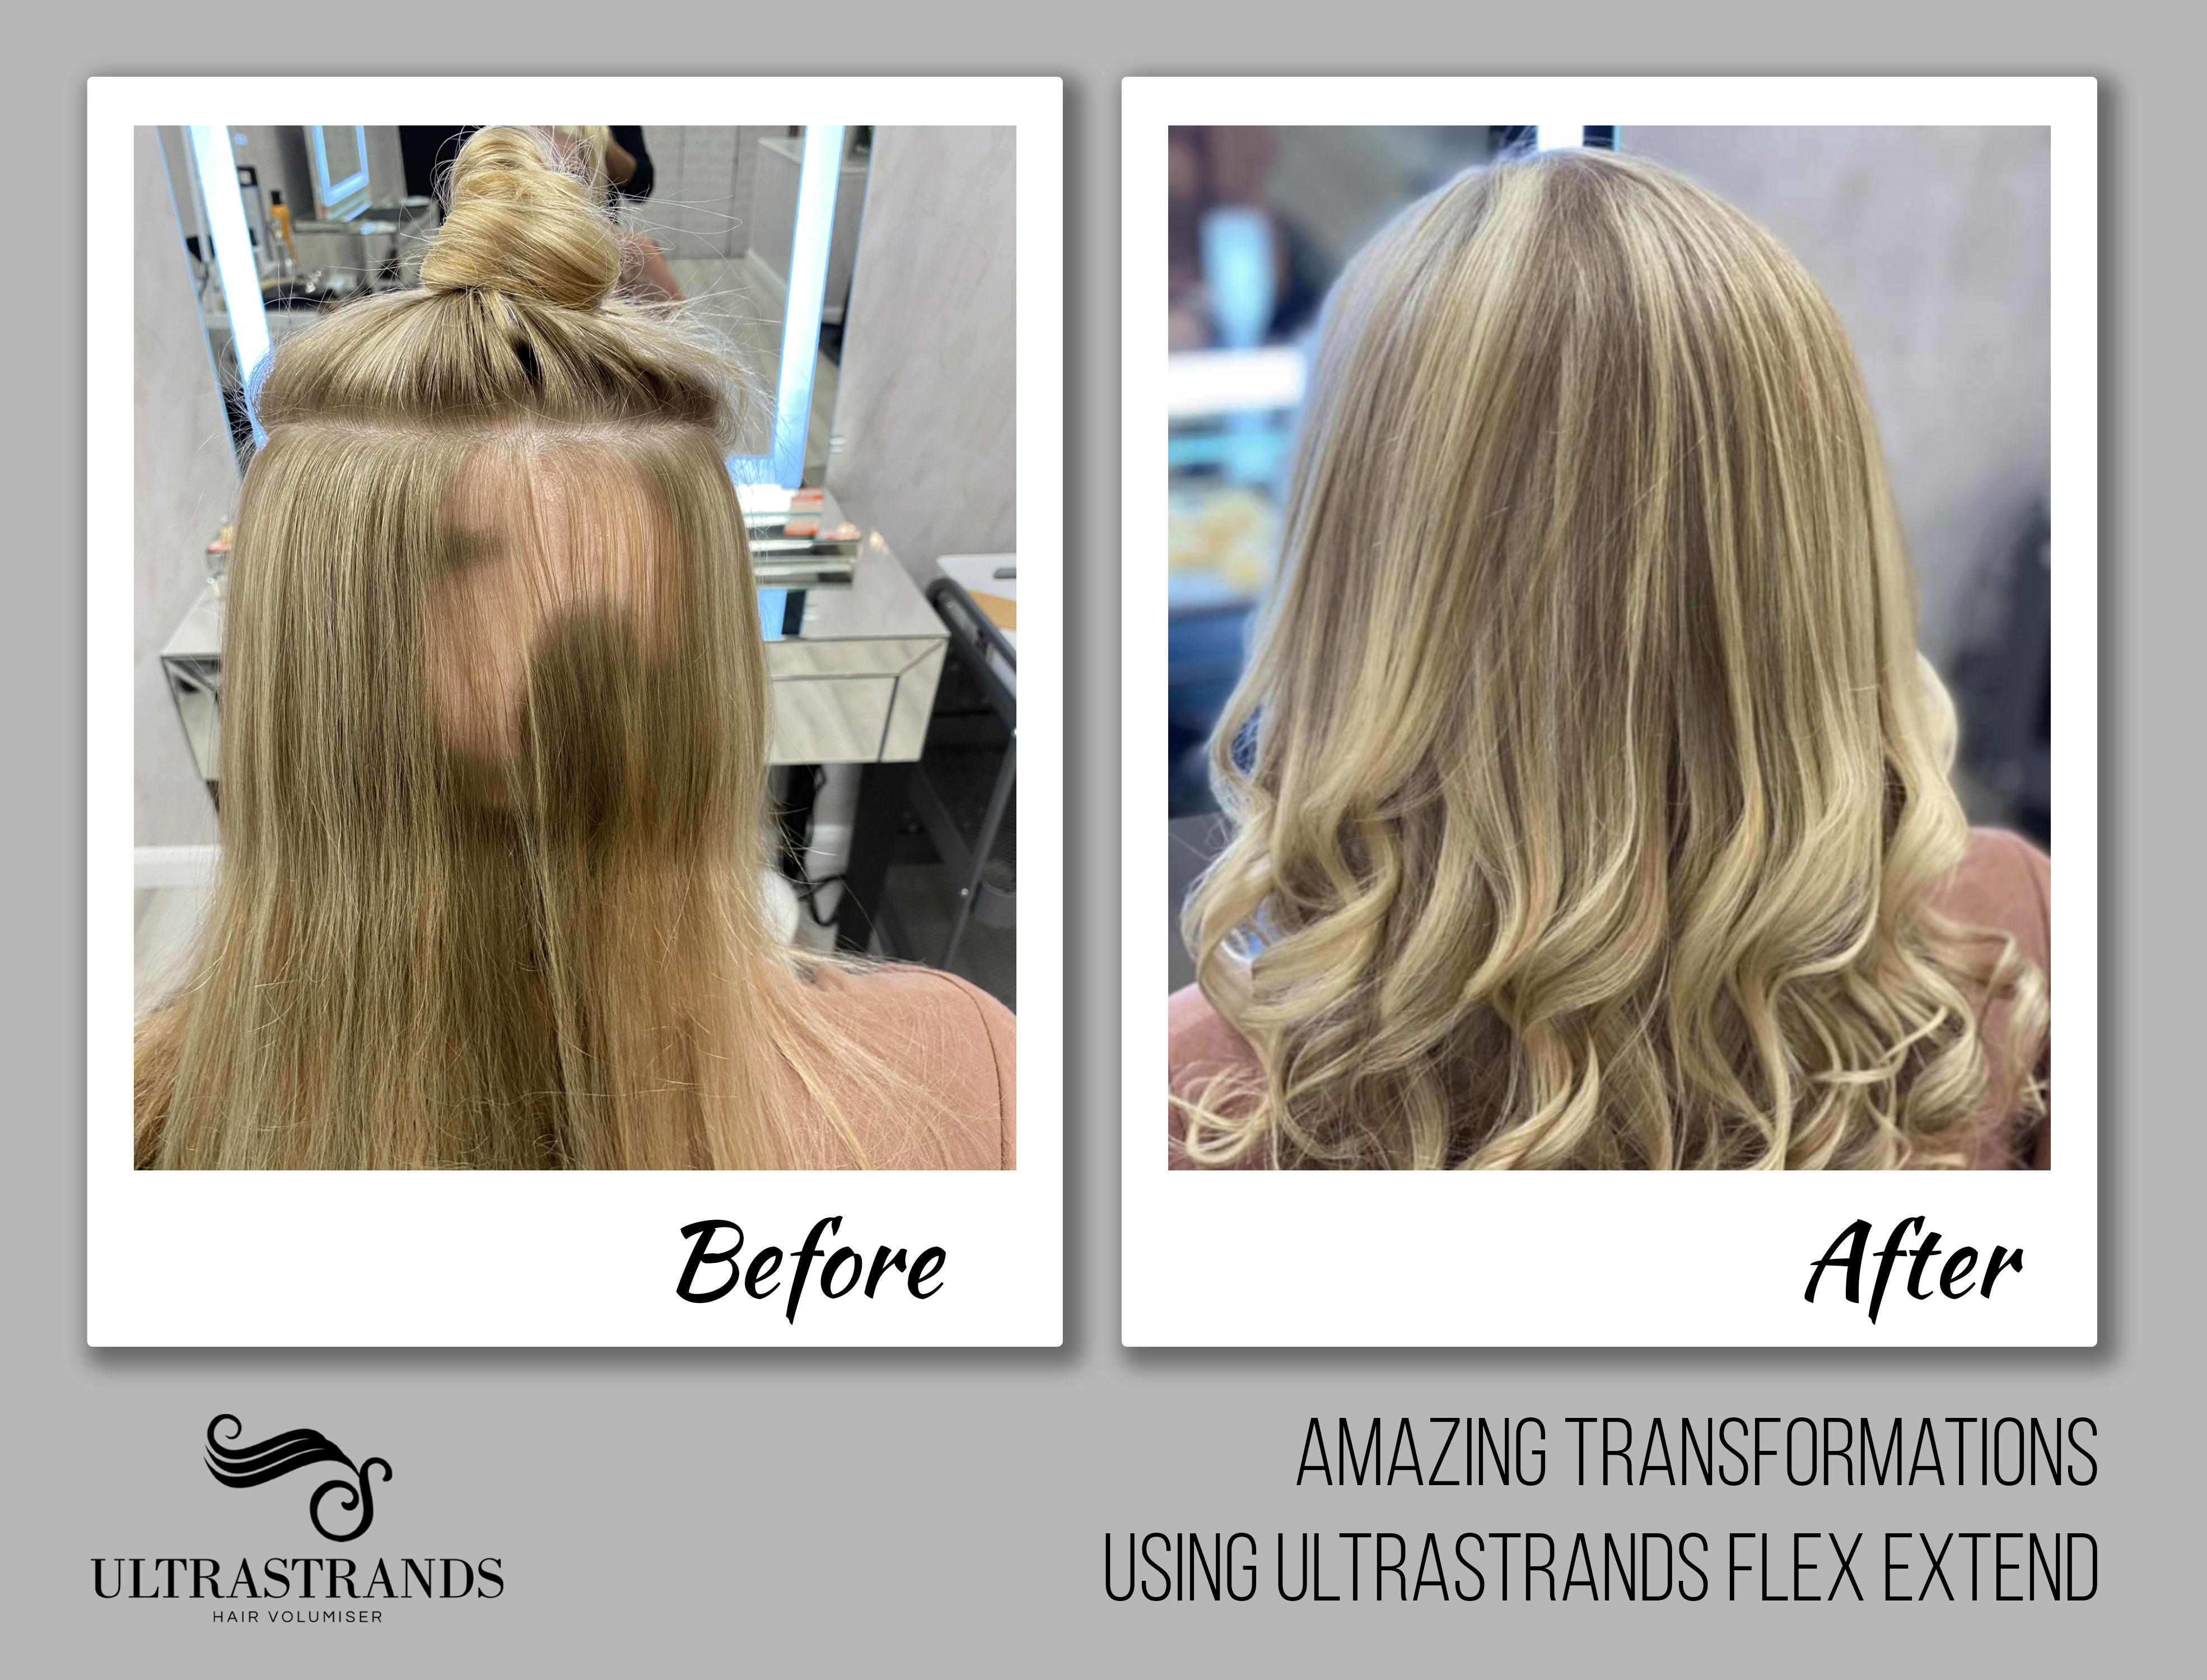 UltraStrands Hair Loss Integration training course